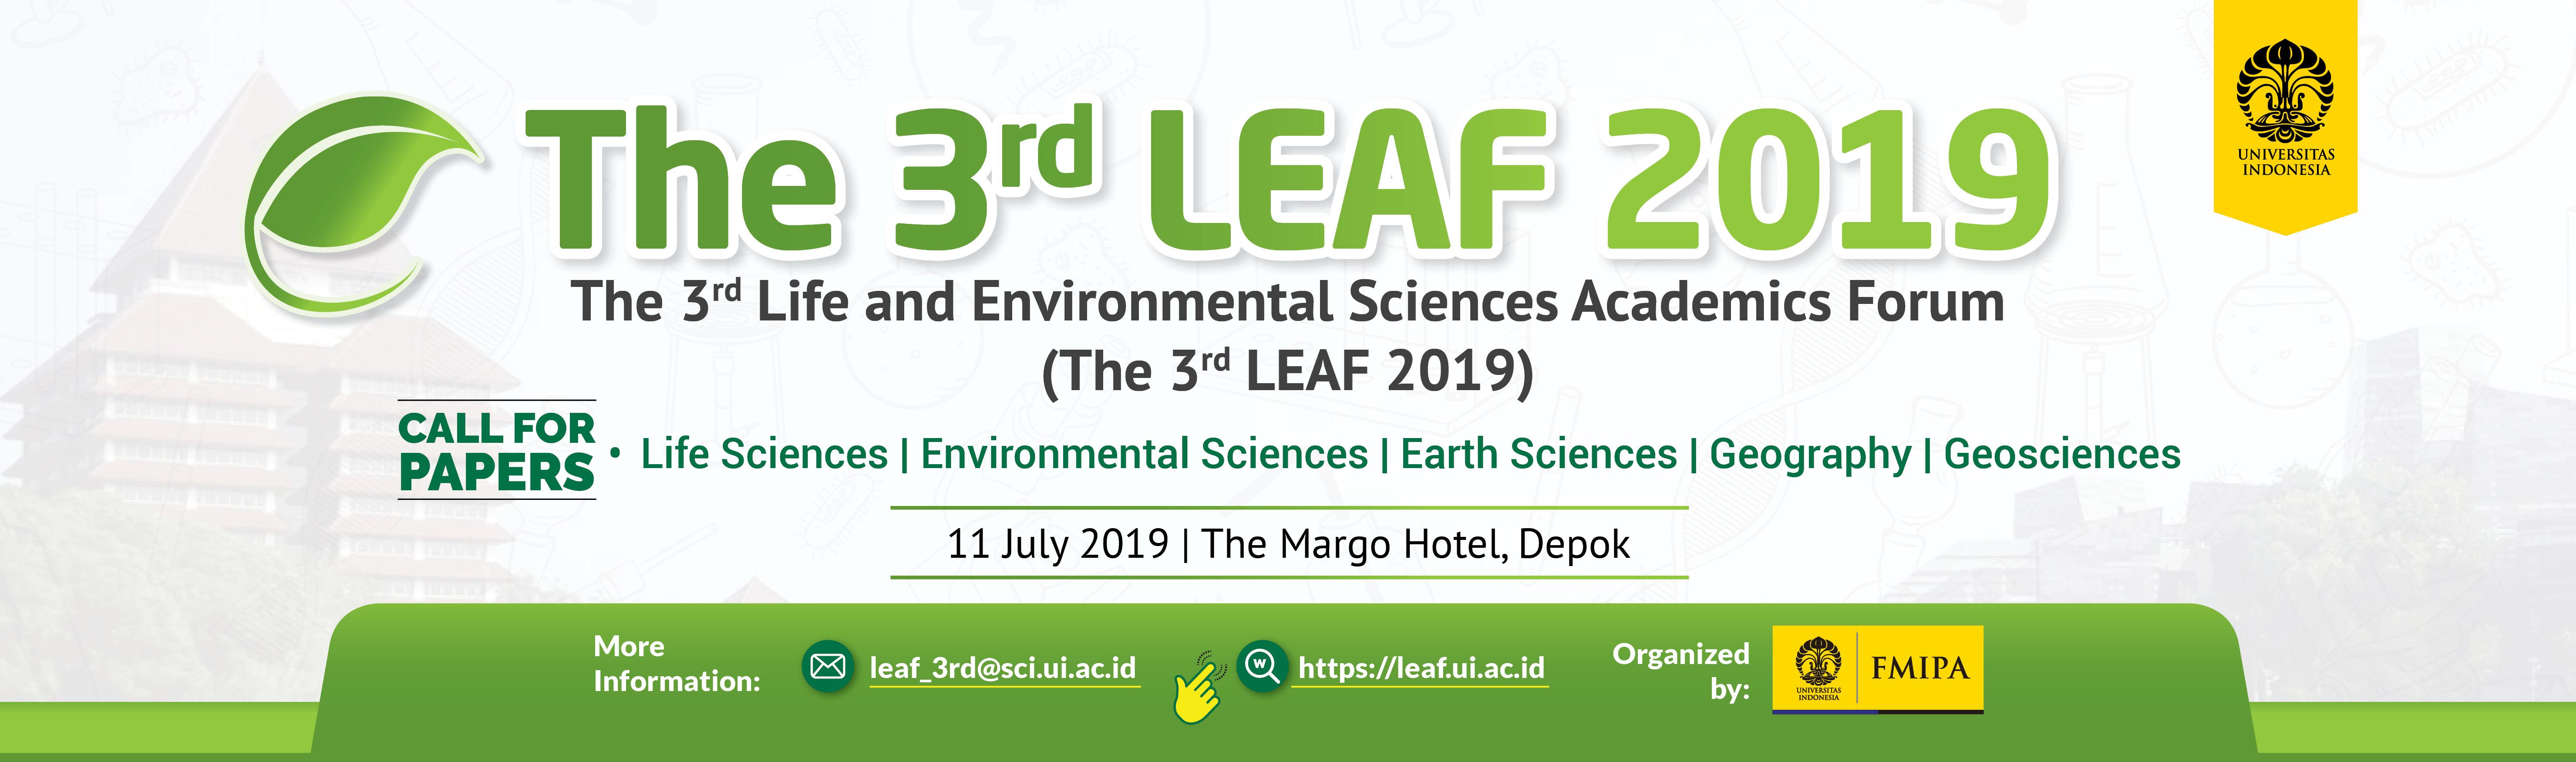 Web-Banner-LEAF-2019_MIPA2